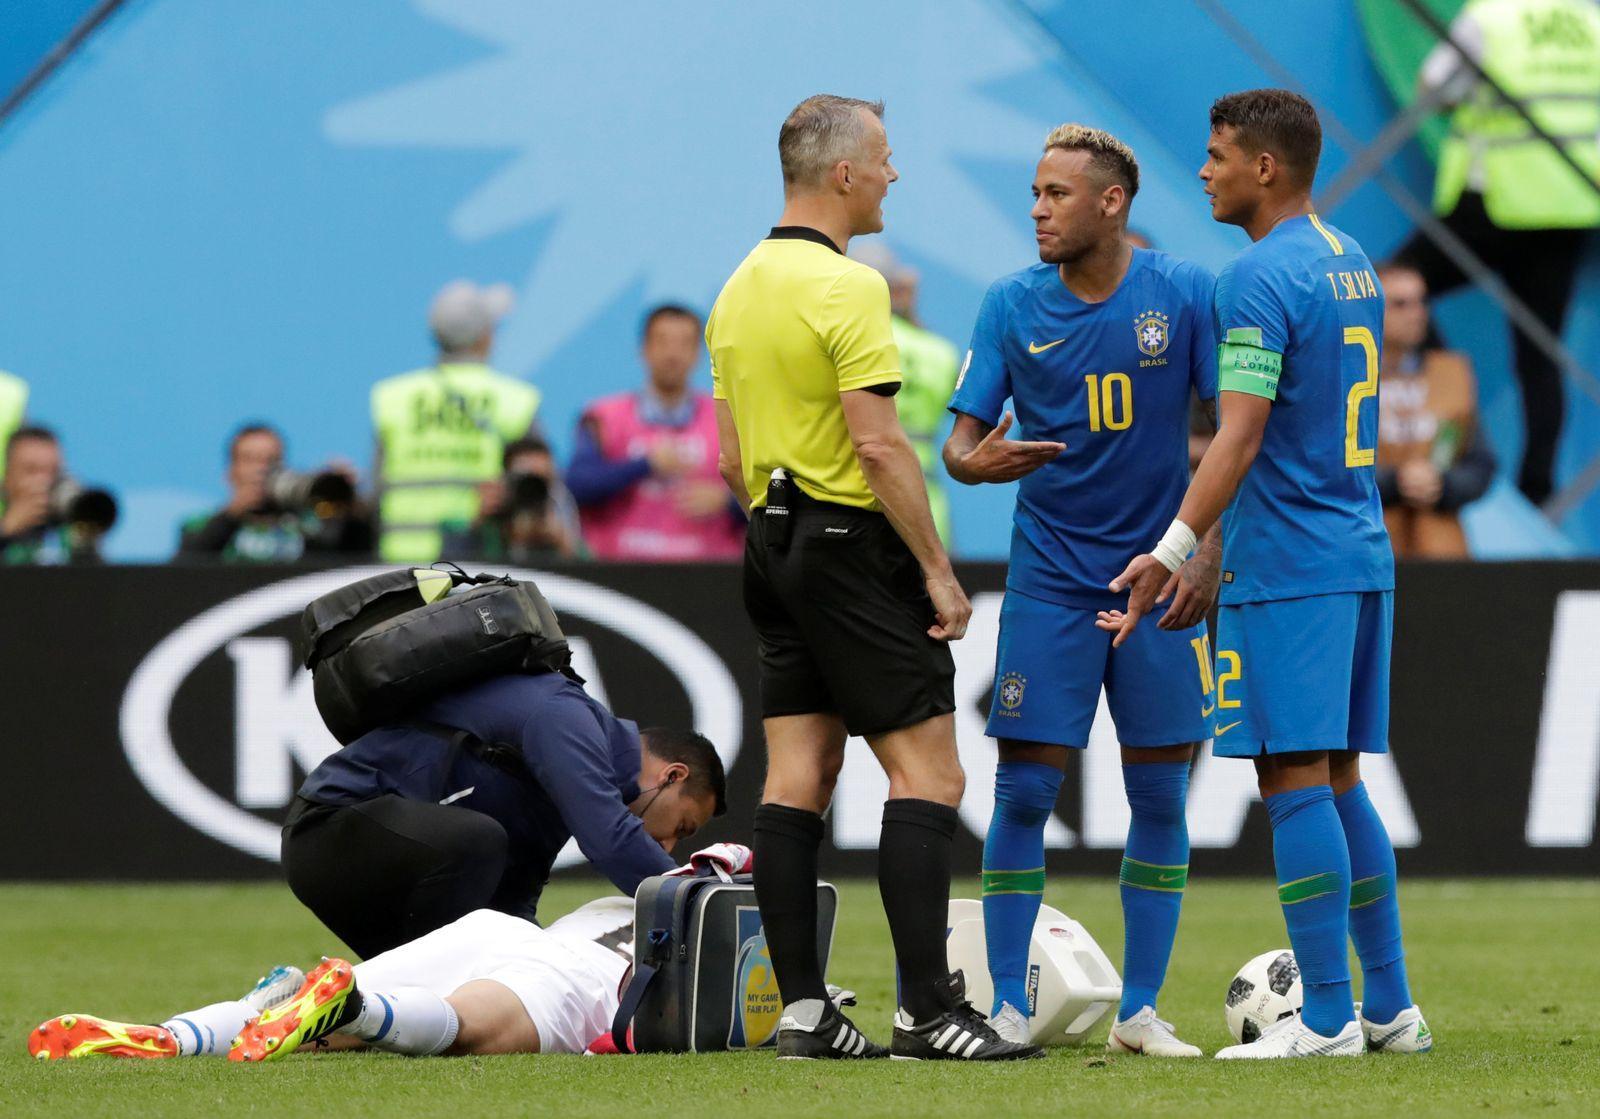 WM/ Fifa/ 2018/ Neymar/ Thiago Silva/ Kuipers